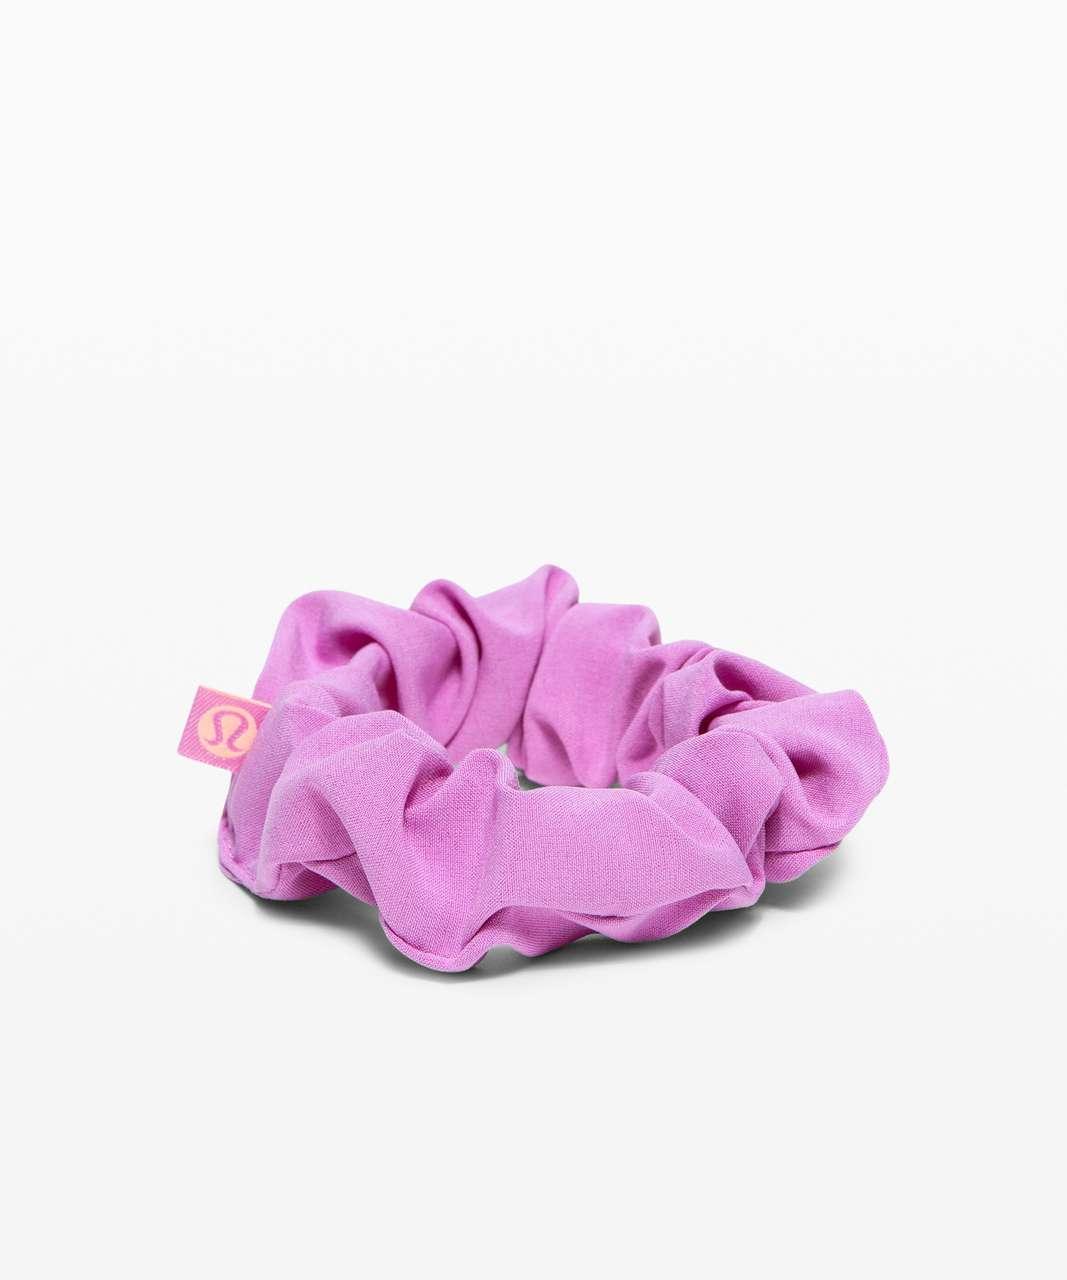 Lululemon Uplifting Scrunchie *SeaWheeze - Purple Blossom